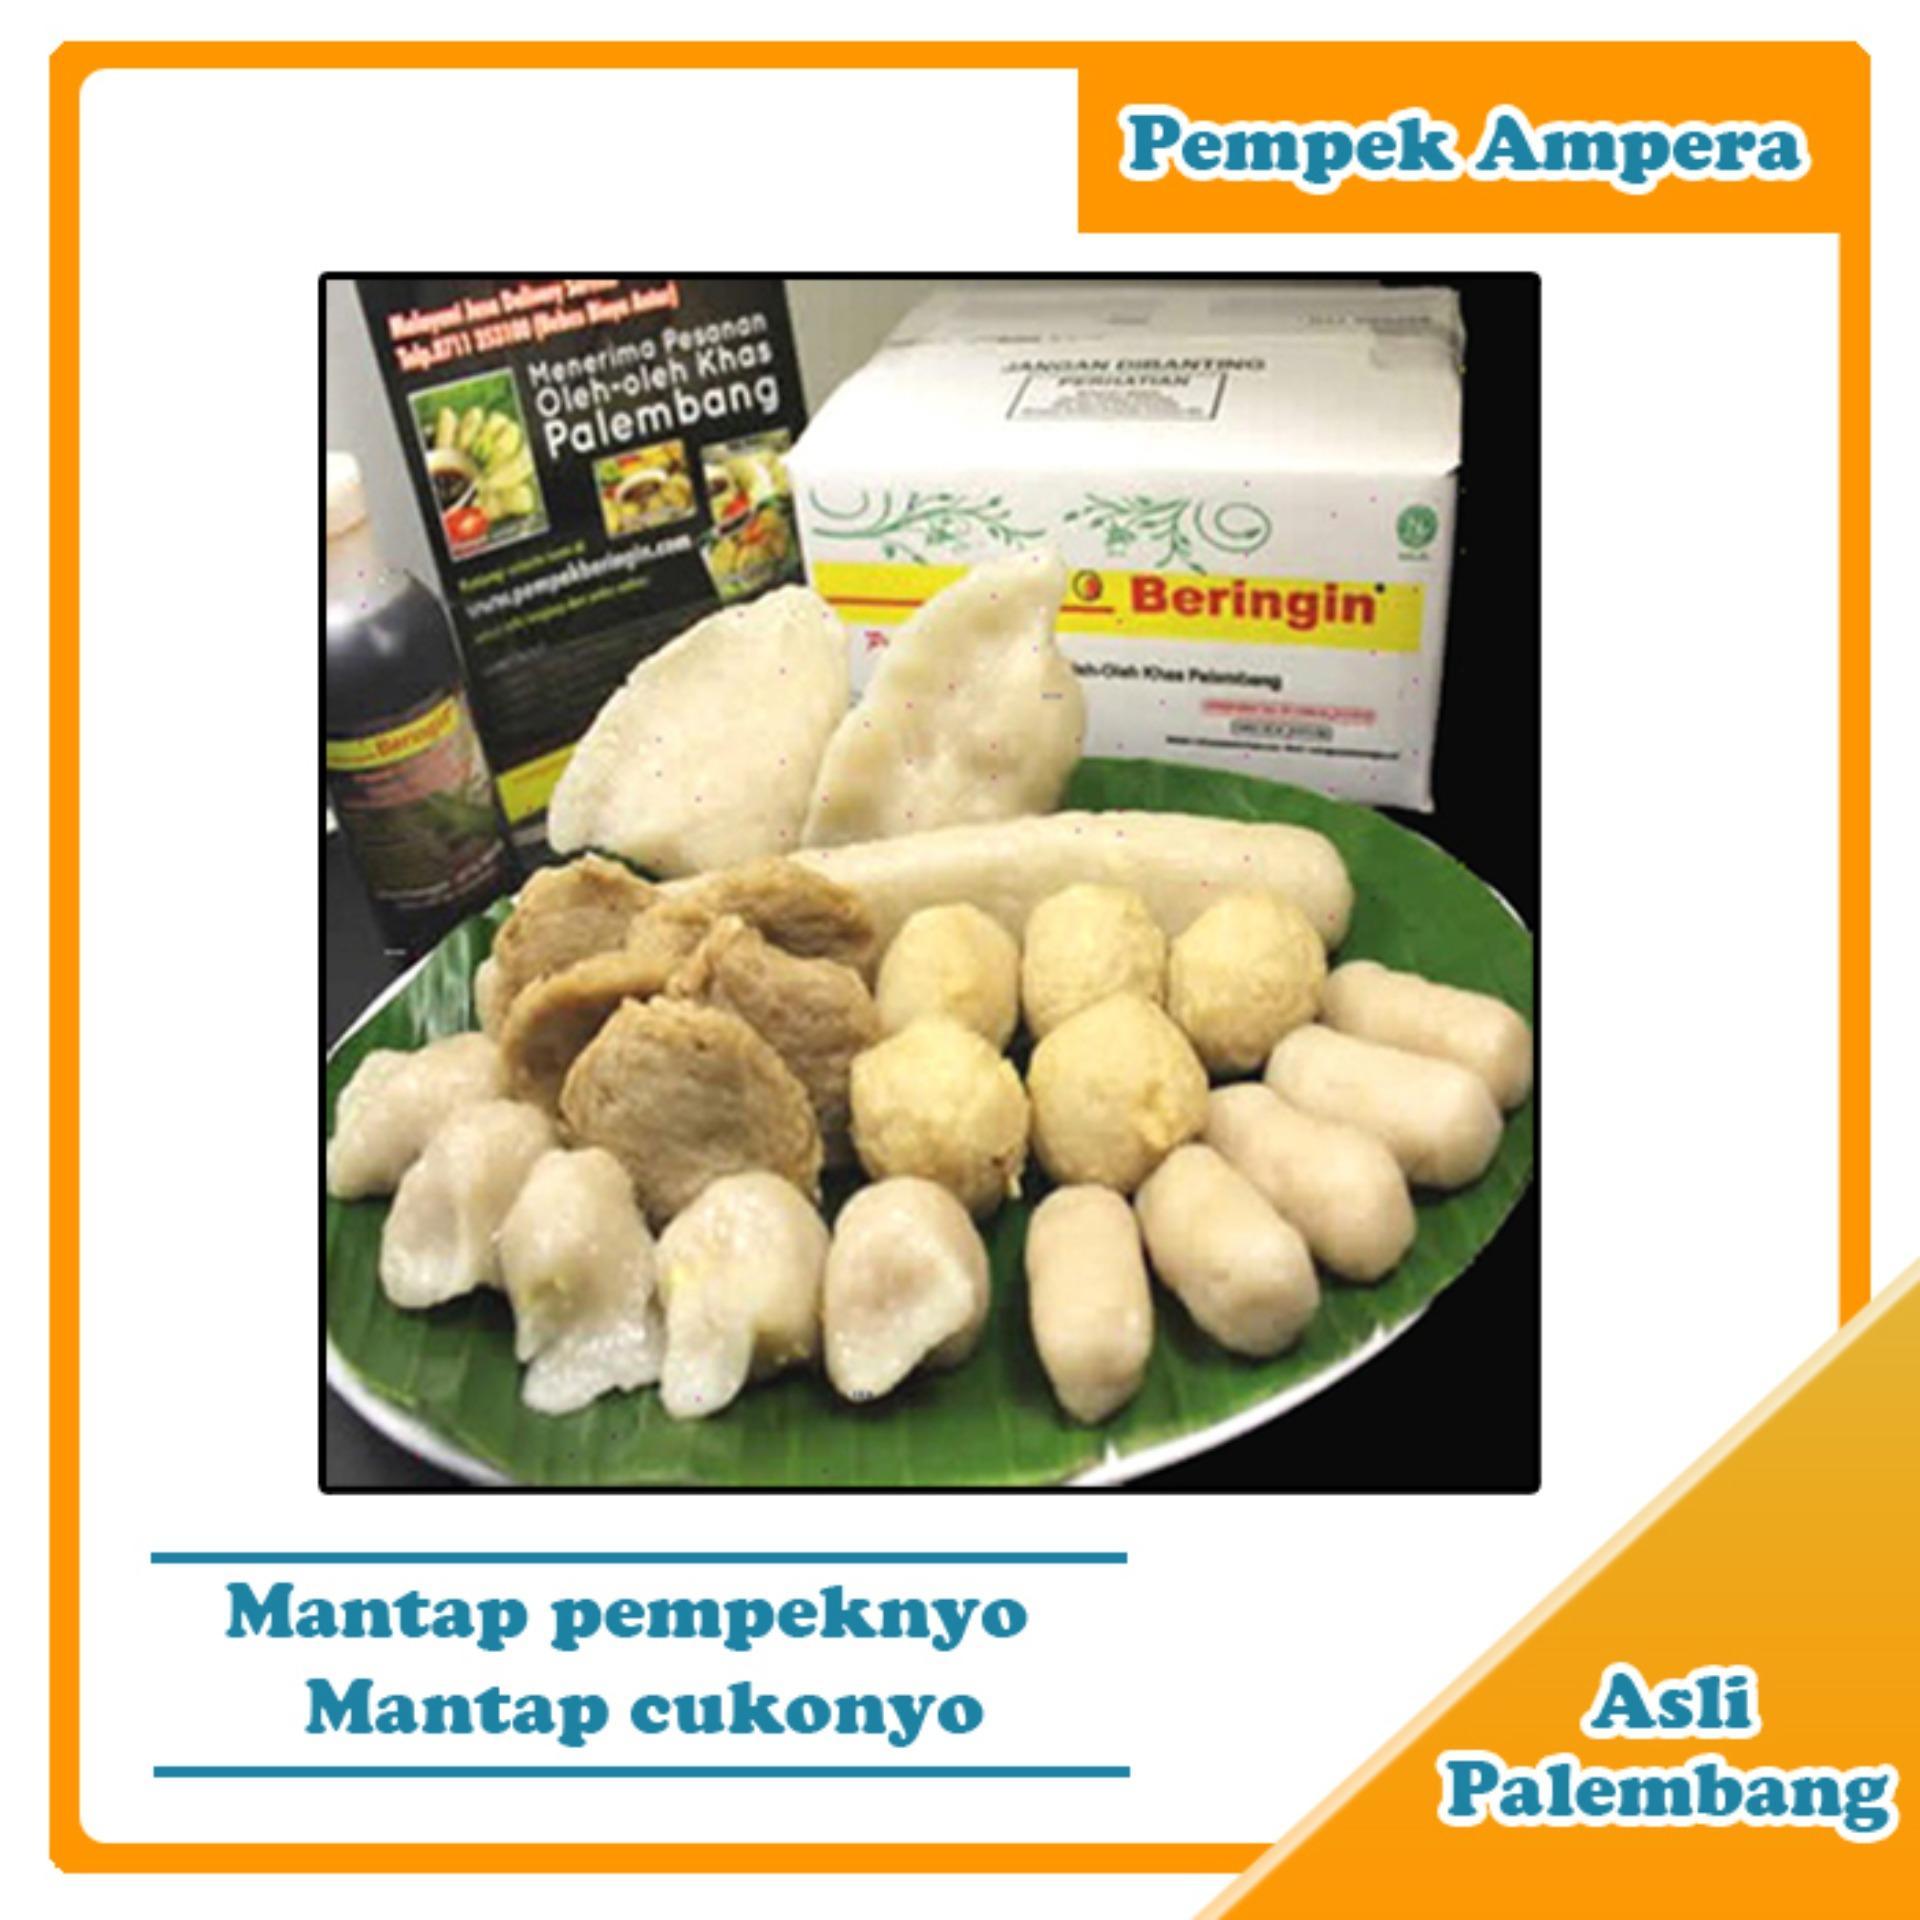 Beringin Pempek Paket 3 Campur Update Harga Terkini Dan Terlengkap Ramatranz Travel Lampung Jakarta Palembang Kilat